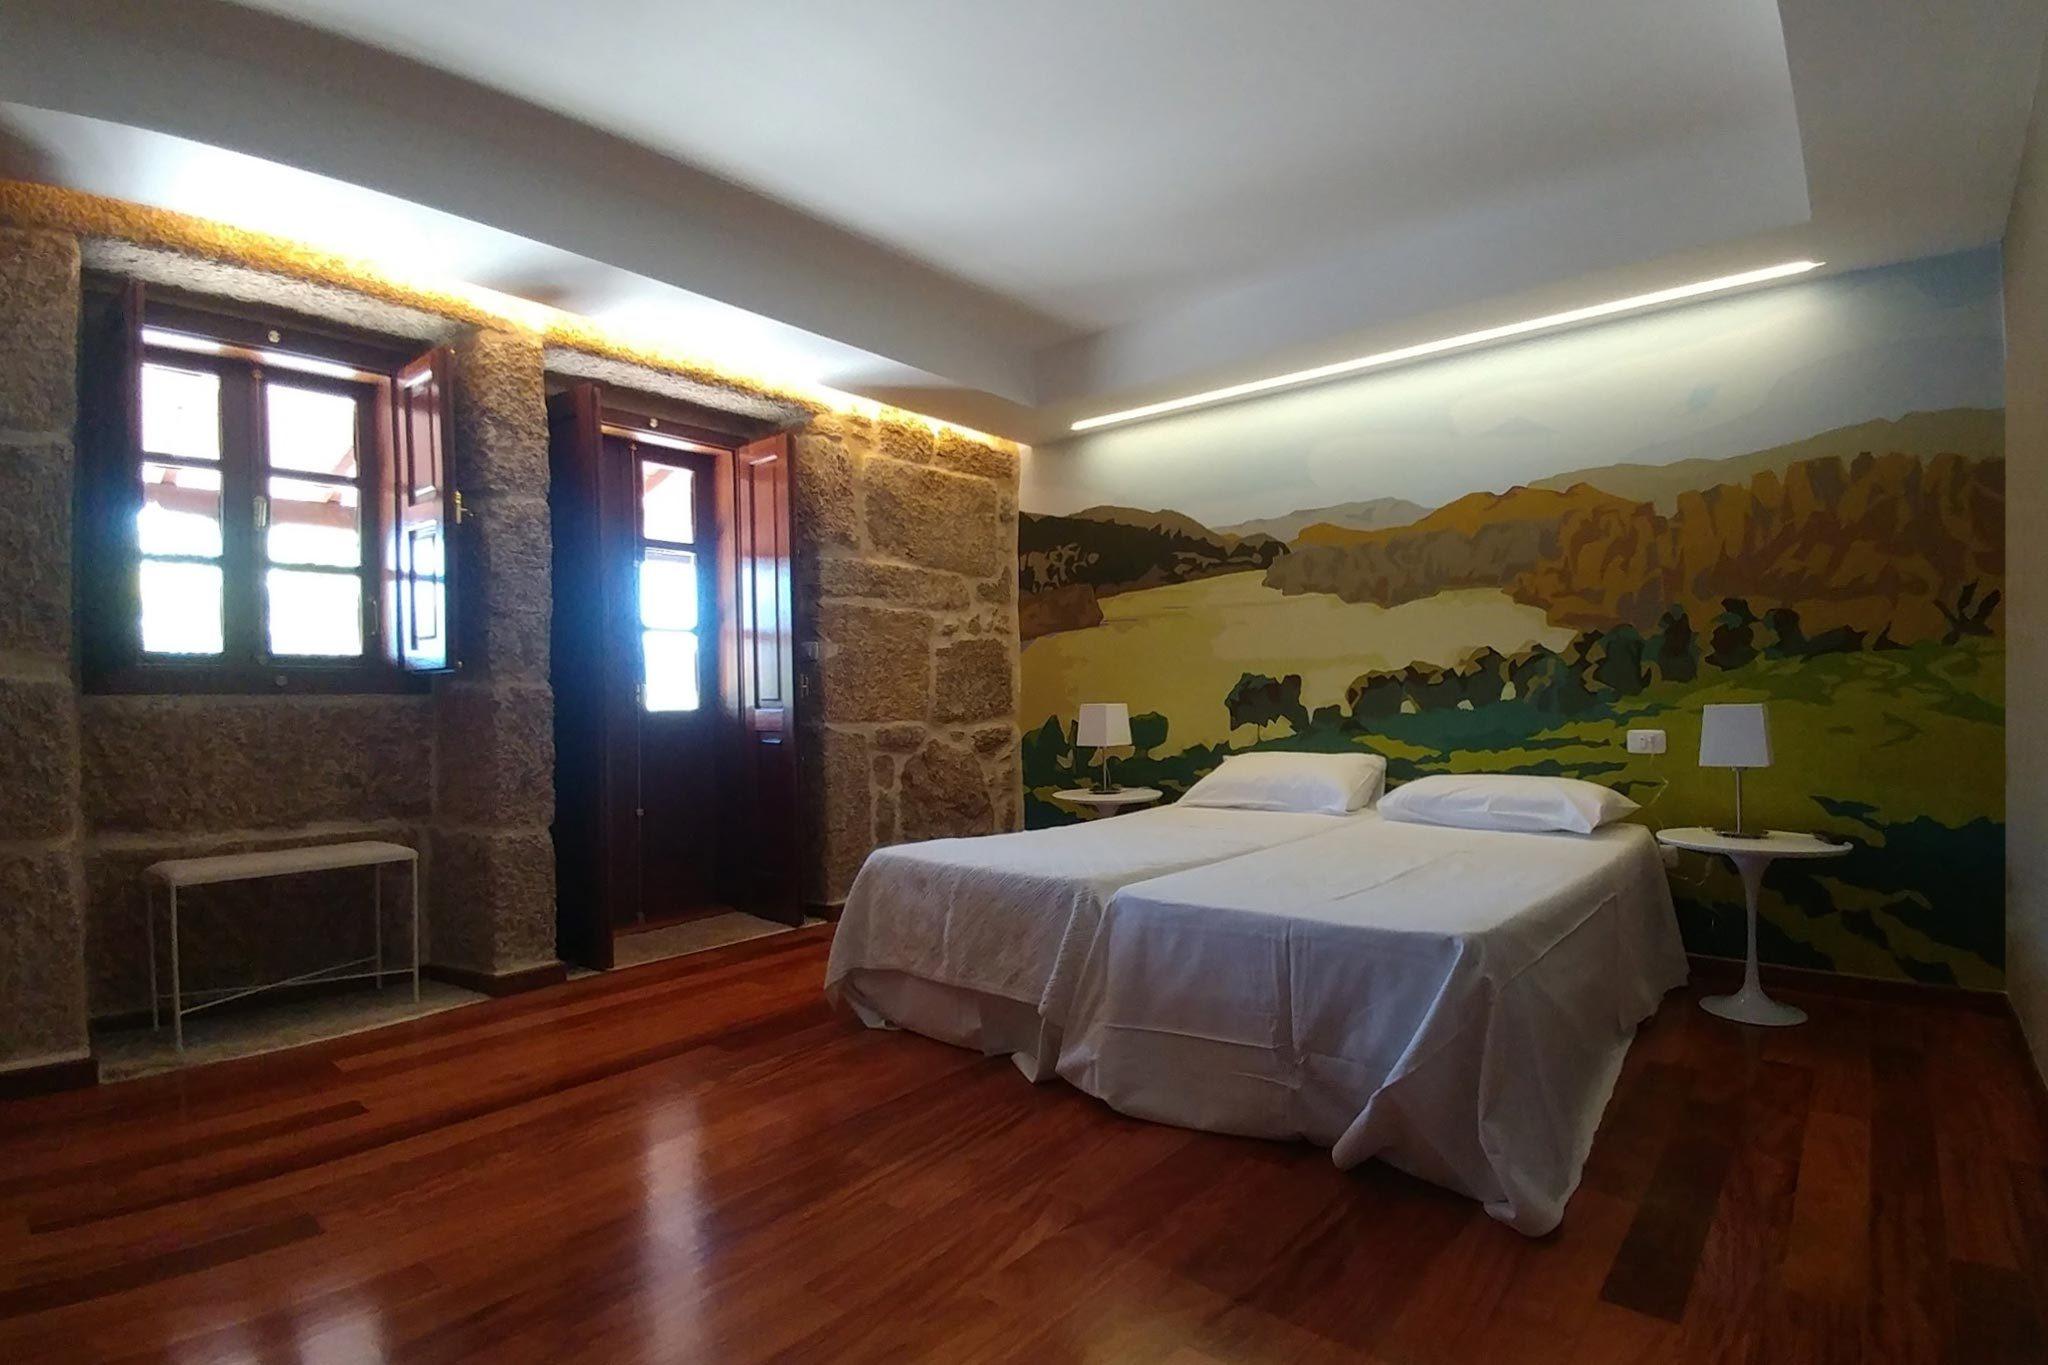 reforma integral del interiorismo de un pazo tradicional gallego Ribadavia Ourense